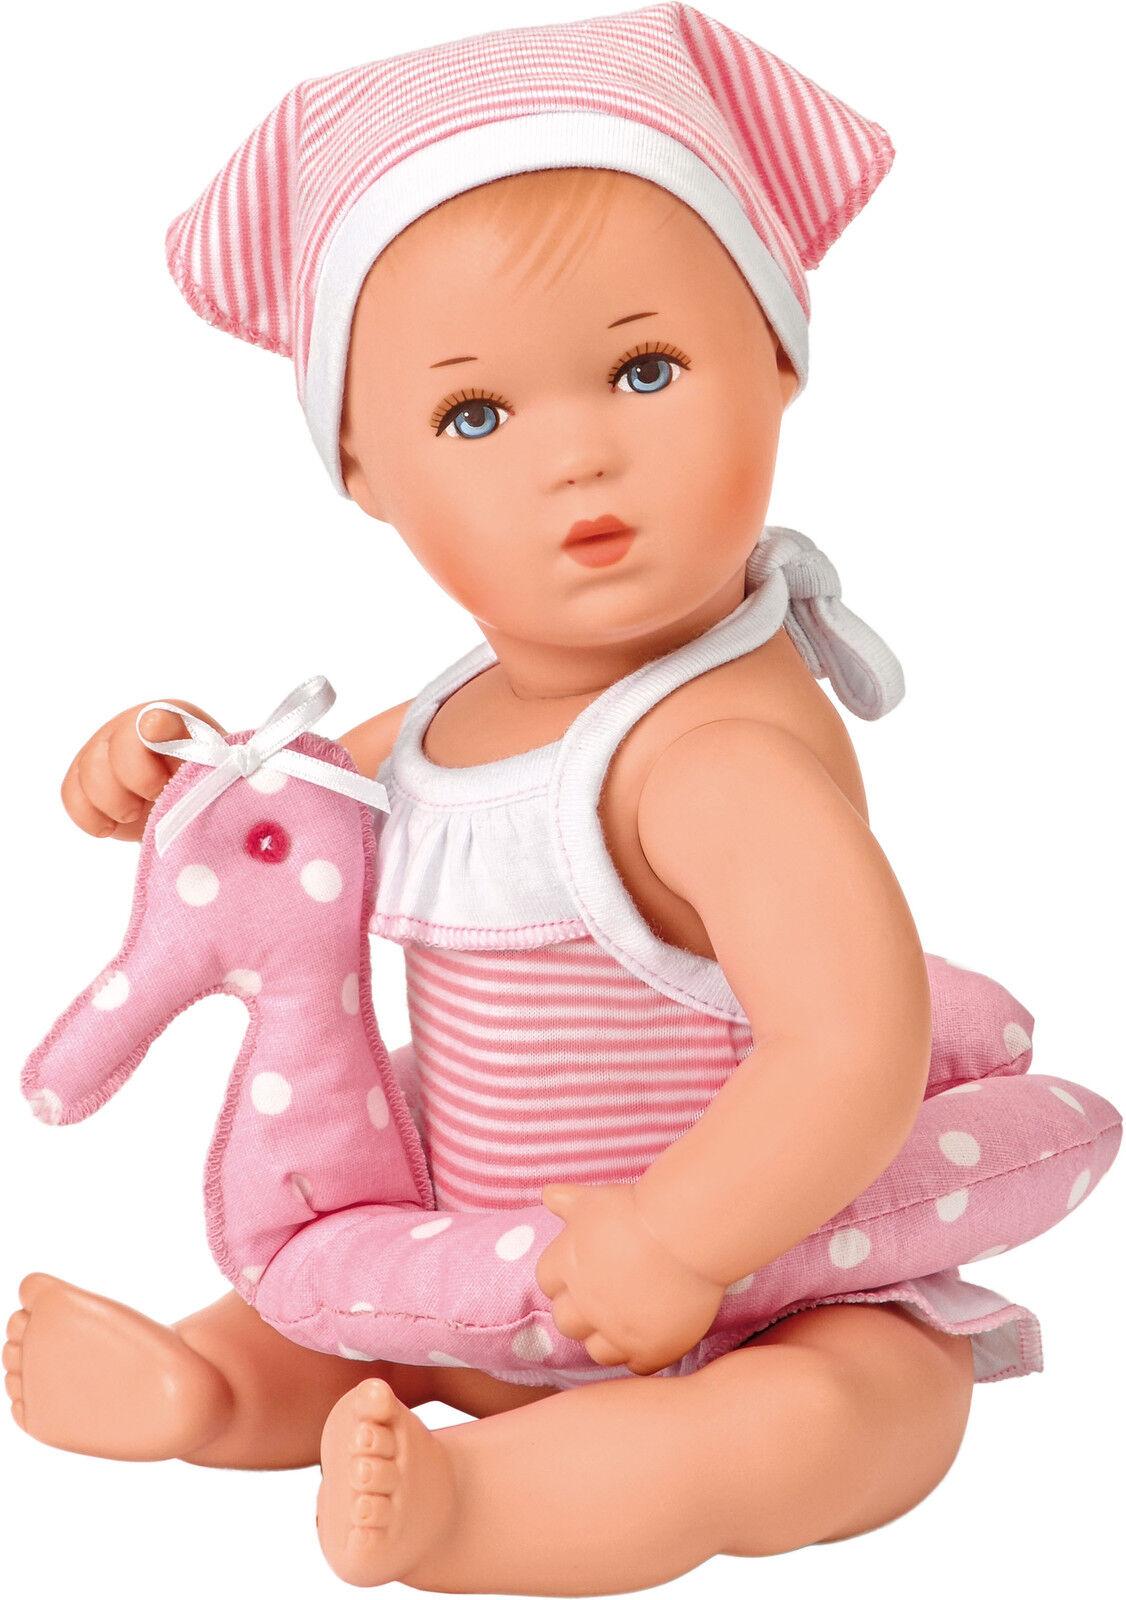 Käthe Kruse Puppe Mini Planscherle Trixi 30603 30 cm Babypuppe Neu & Ovp